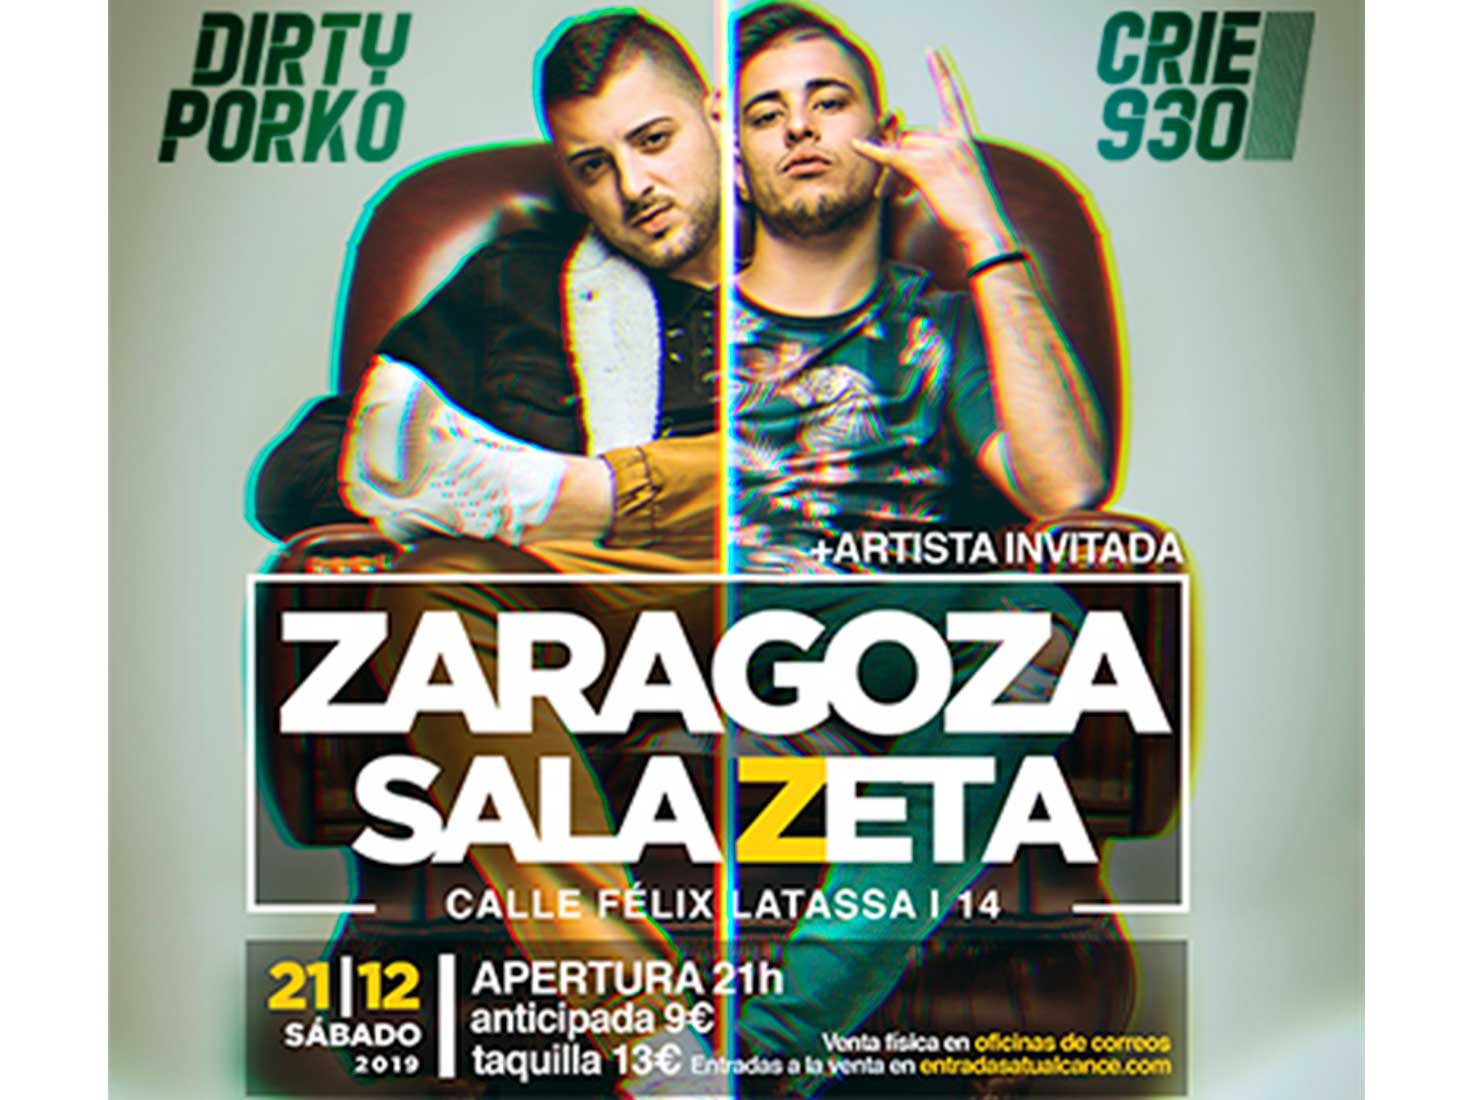 dirtyporko-and-crie930-zaragoza-5dc1310f88b82.jpeg